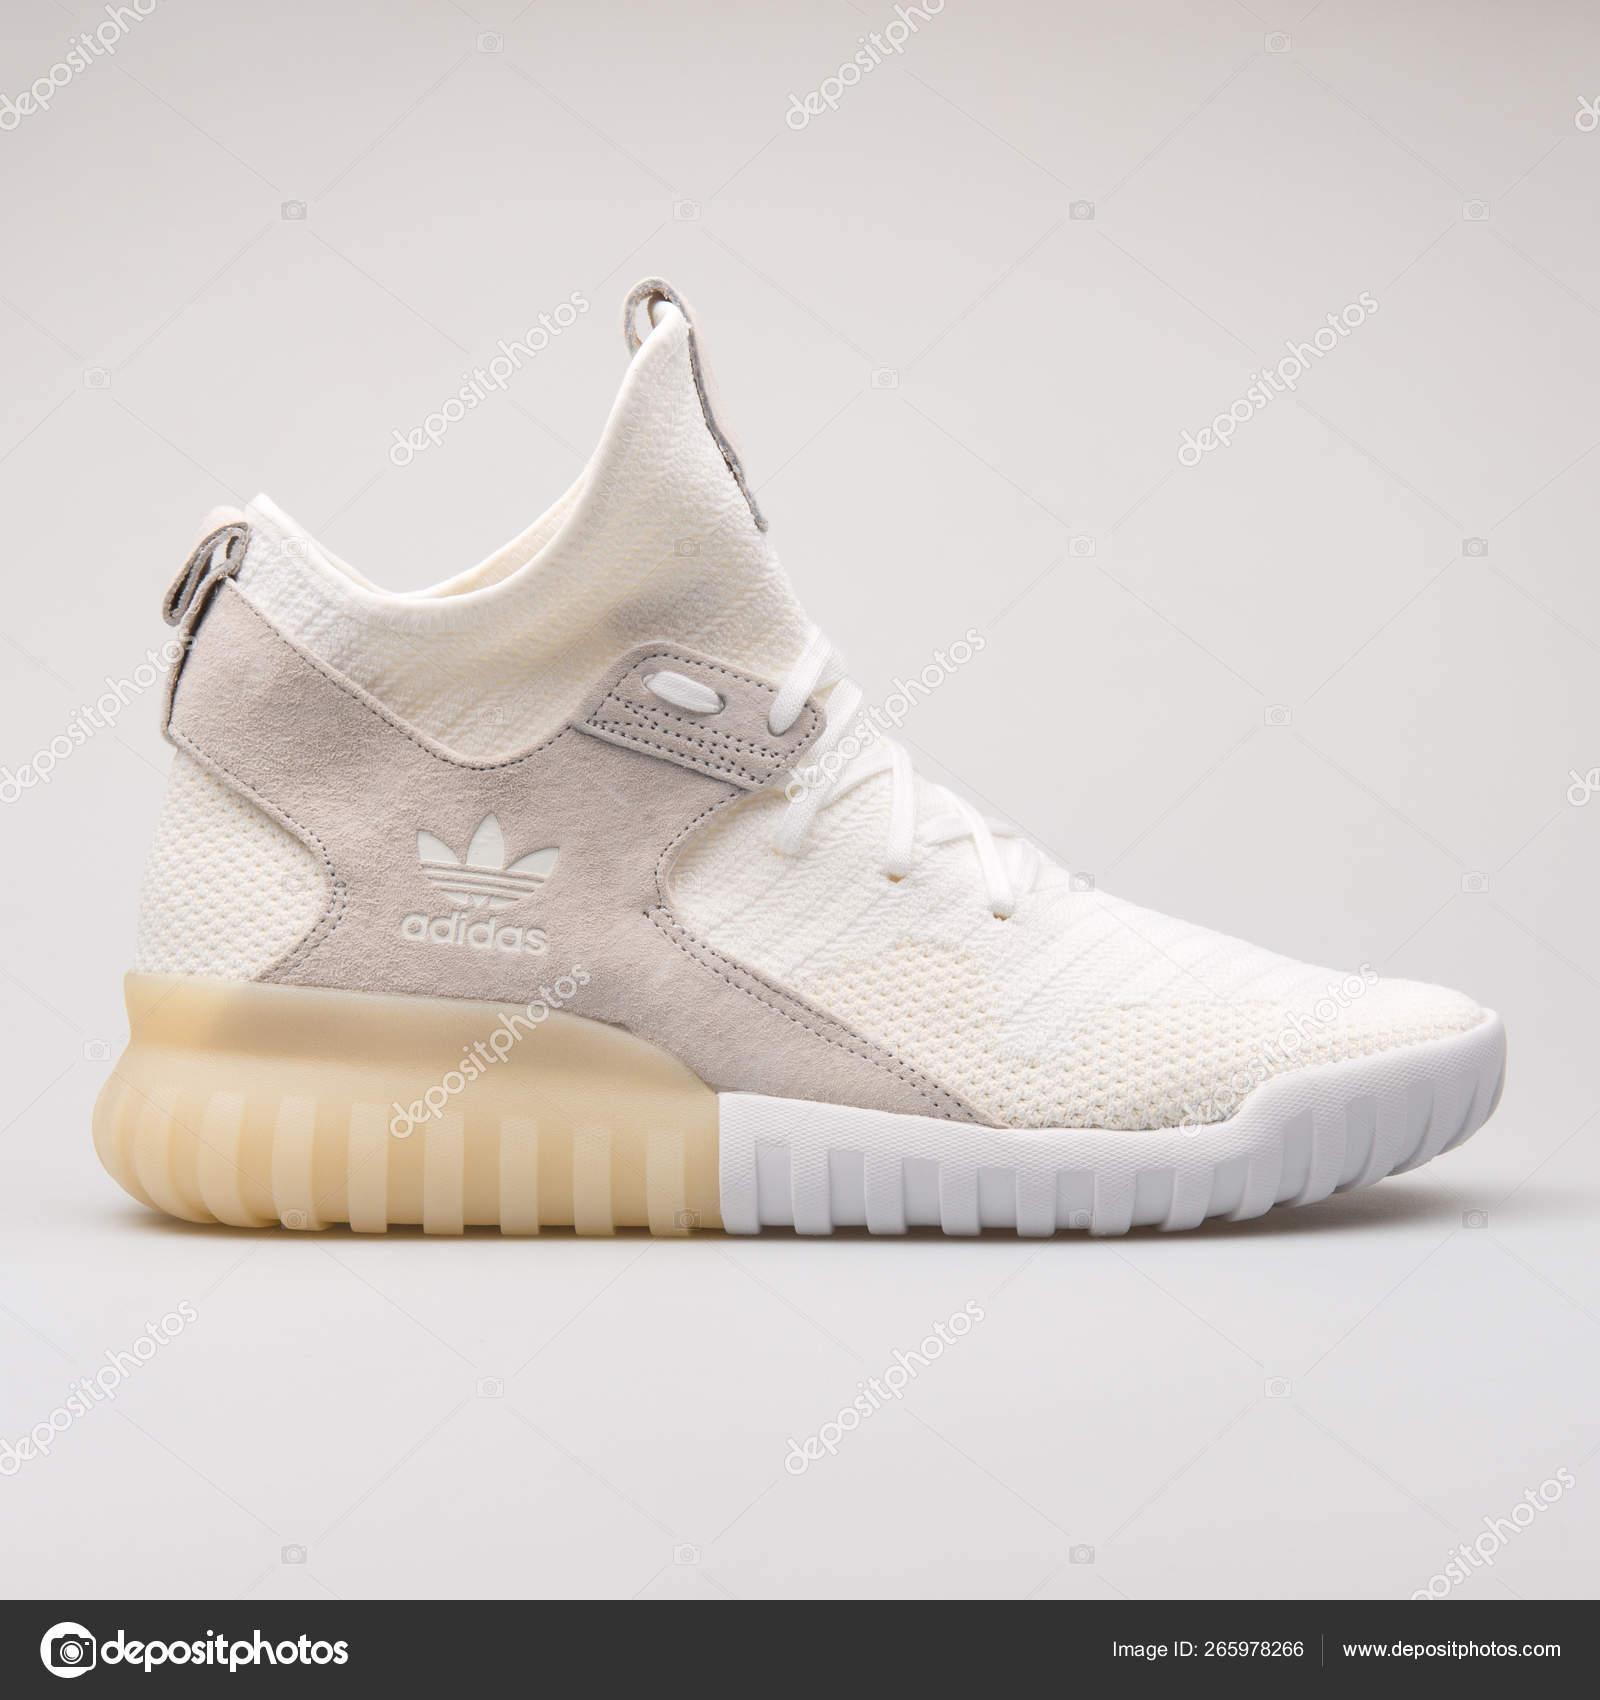 Arrepentimiento vendedor Miseria  Adidas Tubular X PK white sneaker – Stock Editorial Photo © xMarshallfilms  #265978266